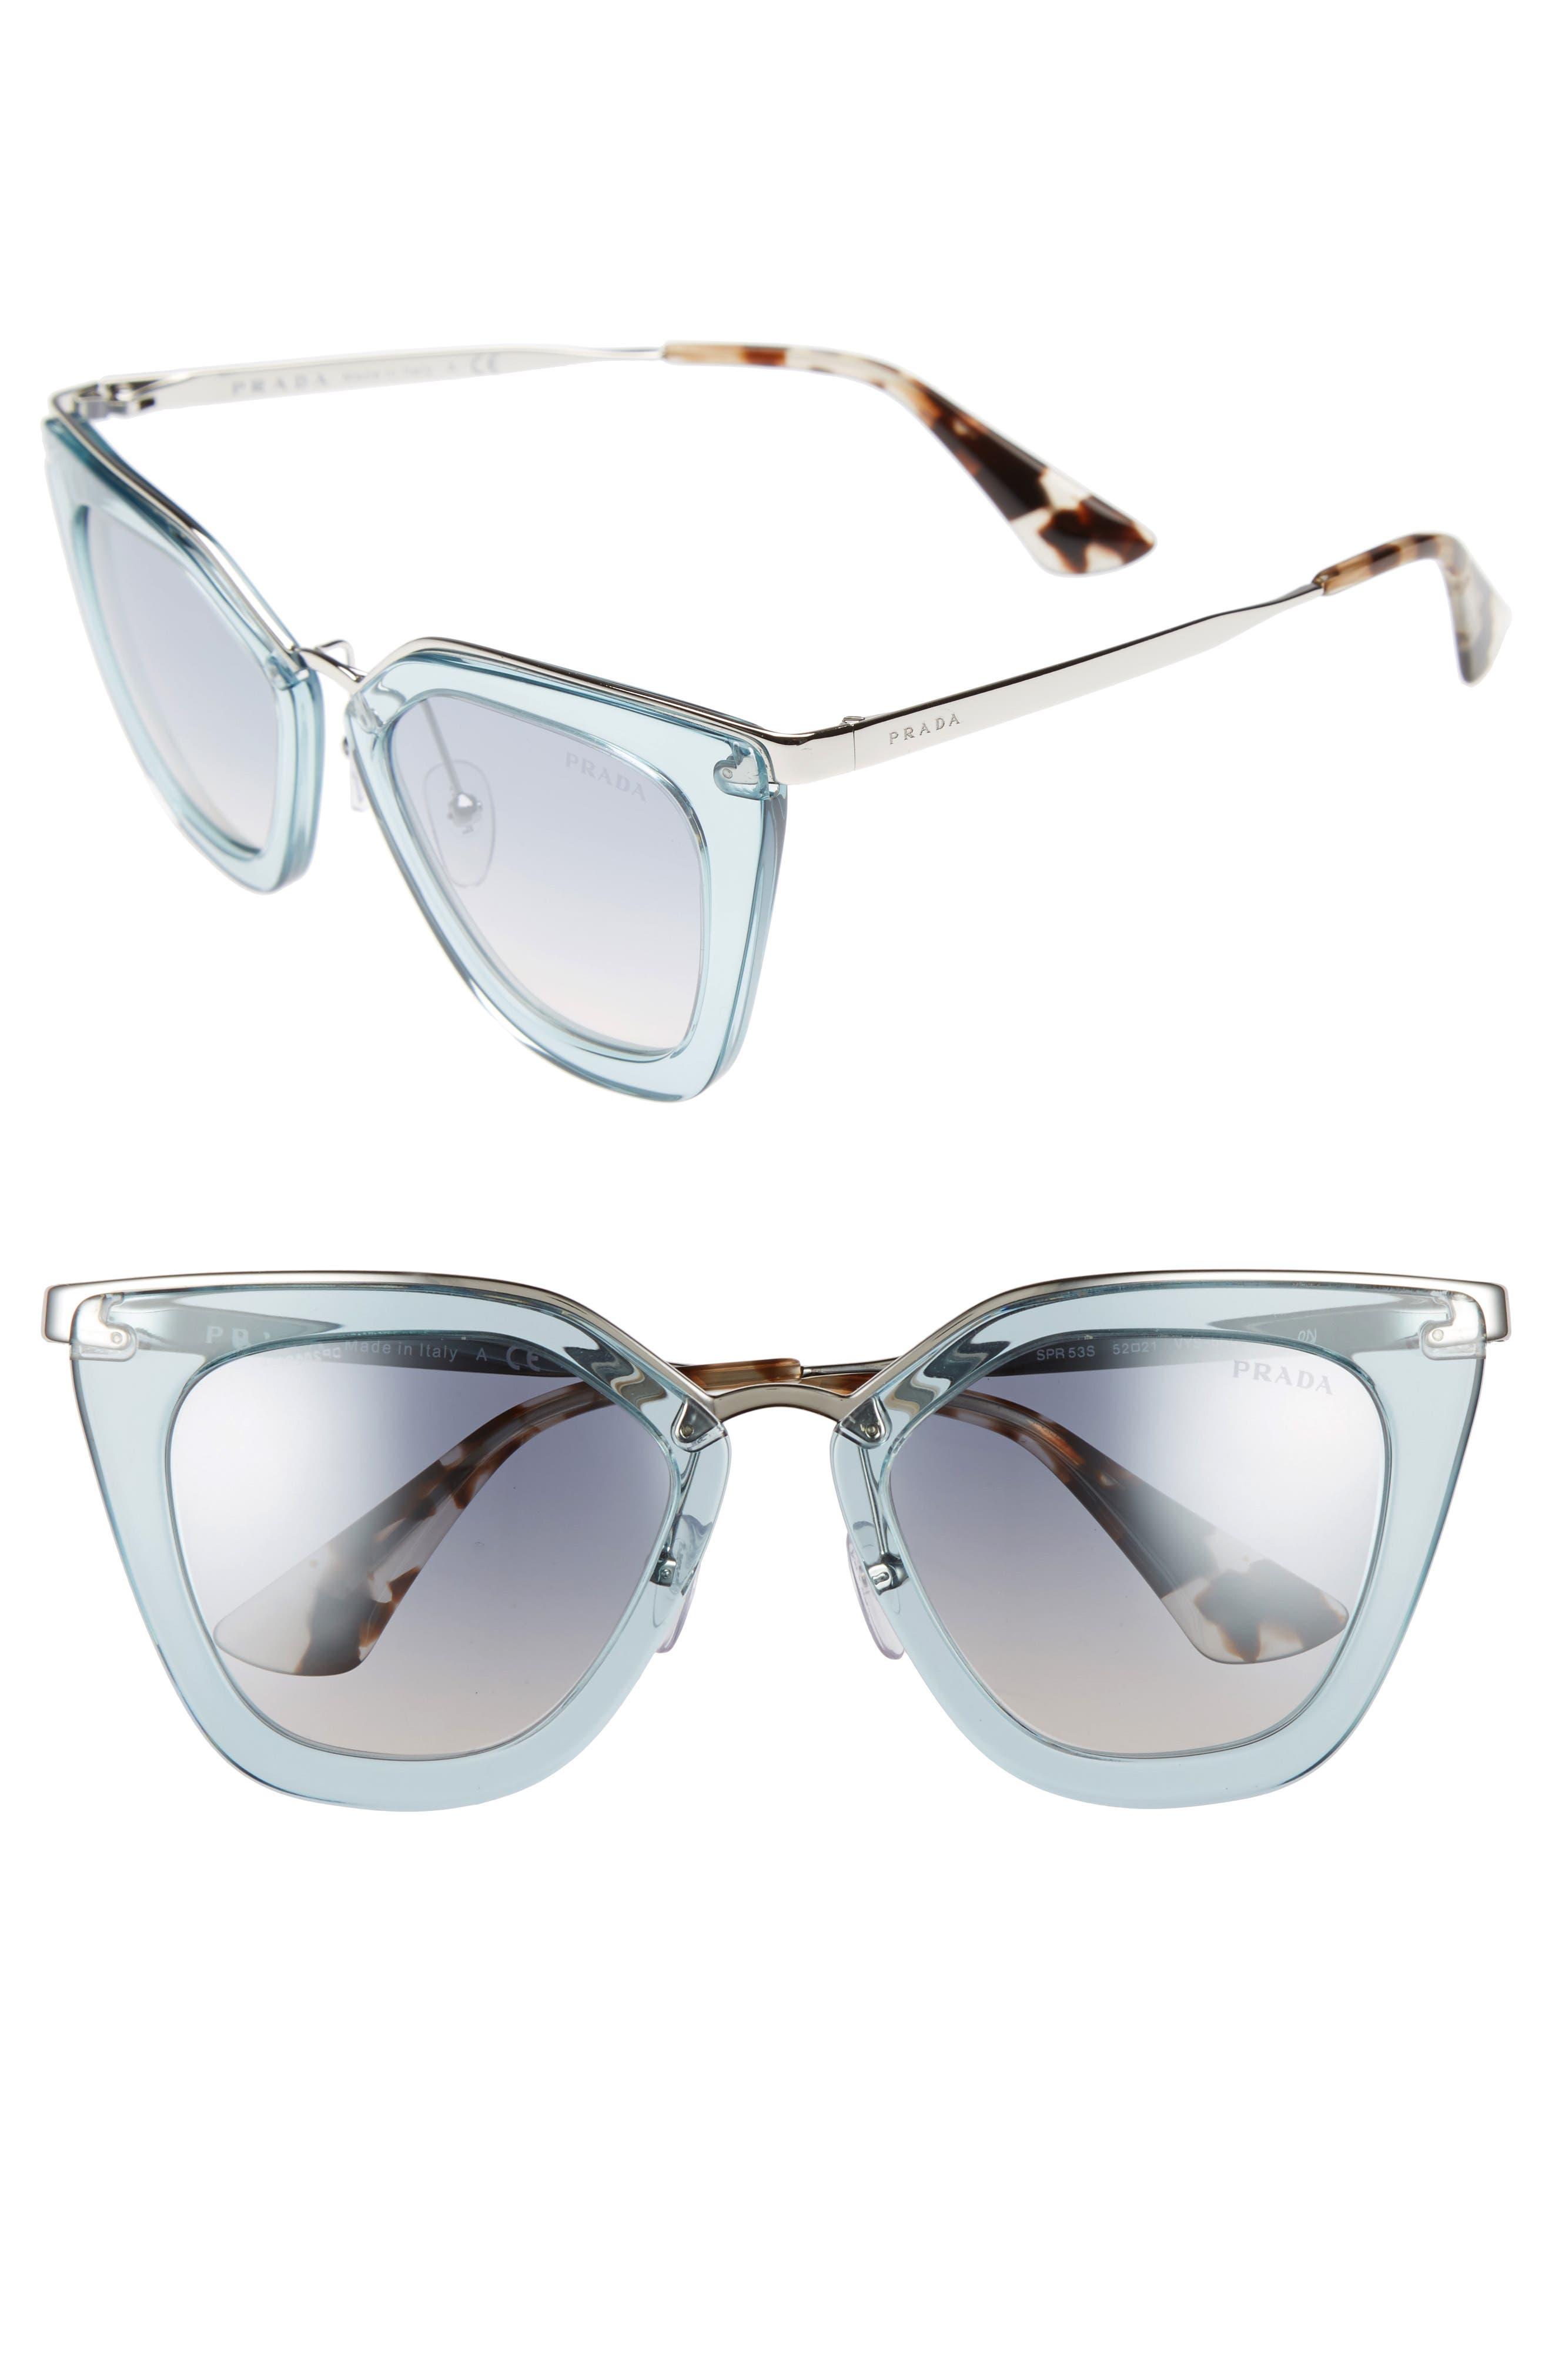 Main Image - Prada 52mm Retro Sunglasses